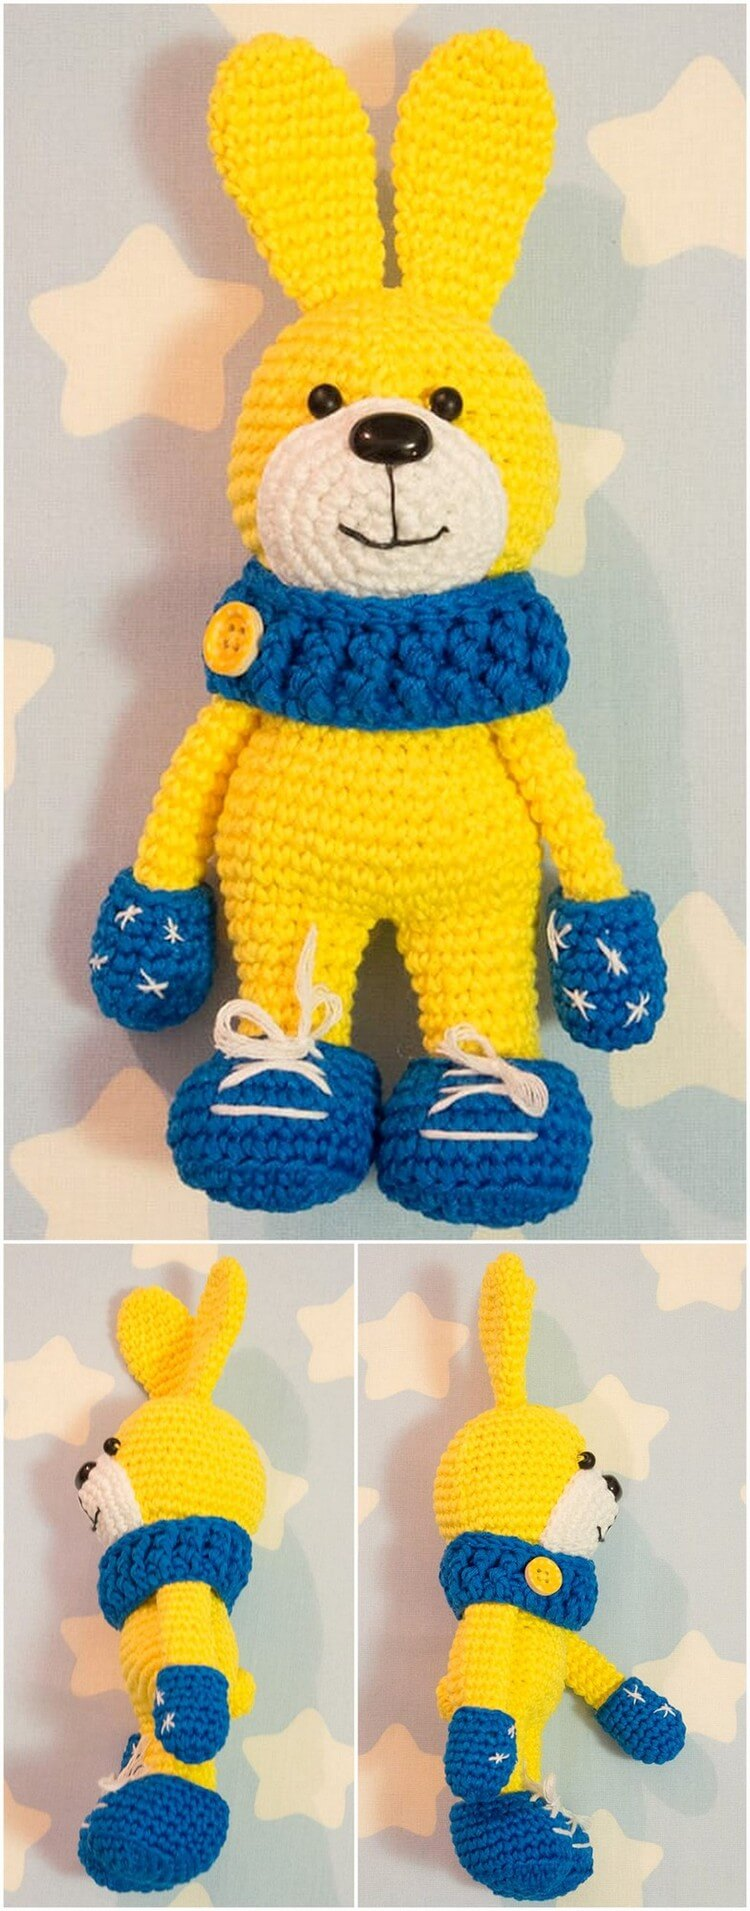 Crochet Amigurumi Pattern (75)